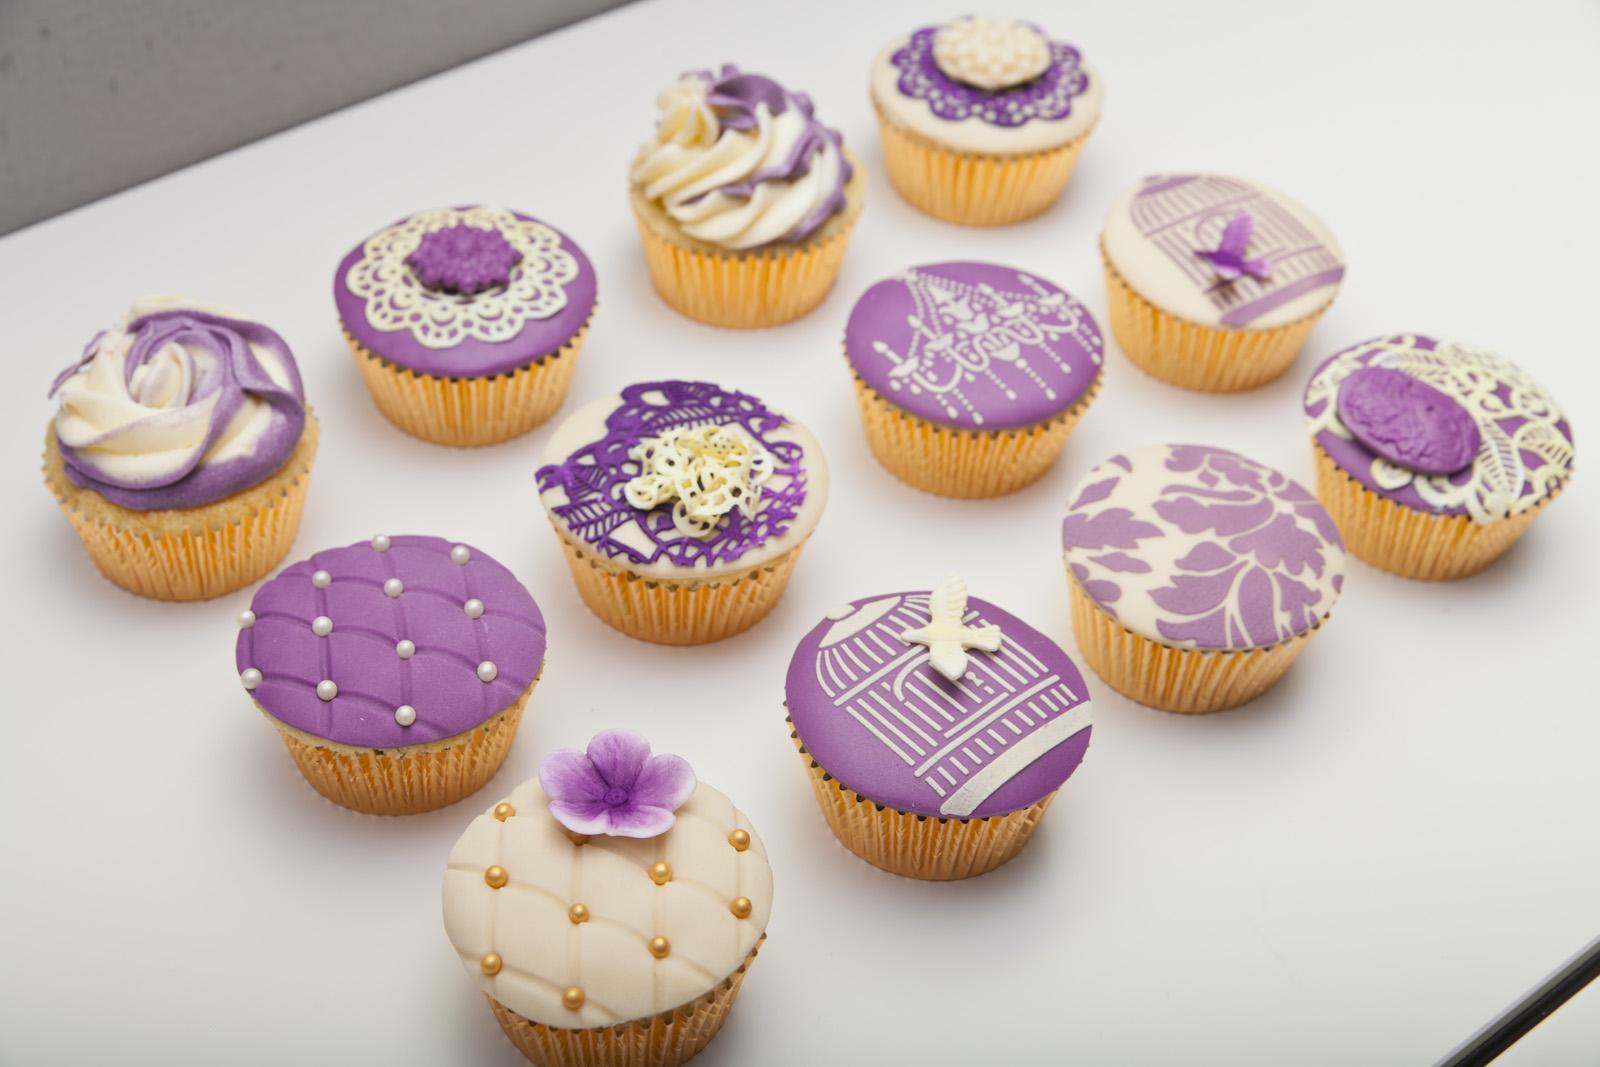 neue Kurstermine: Vintage Cupcakes-Kurs und Fondant-Basic-Kurs